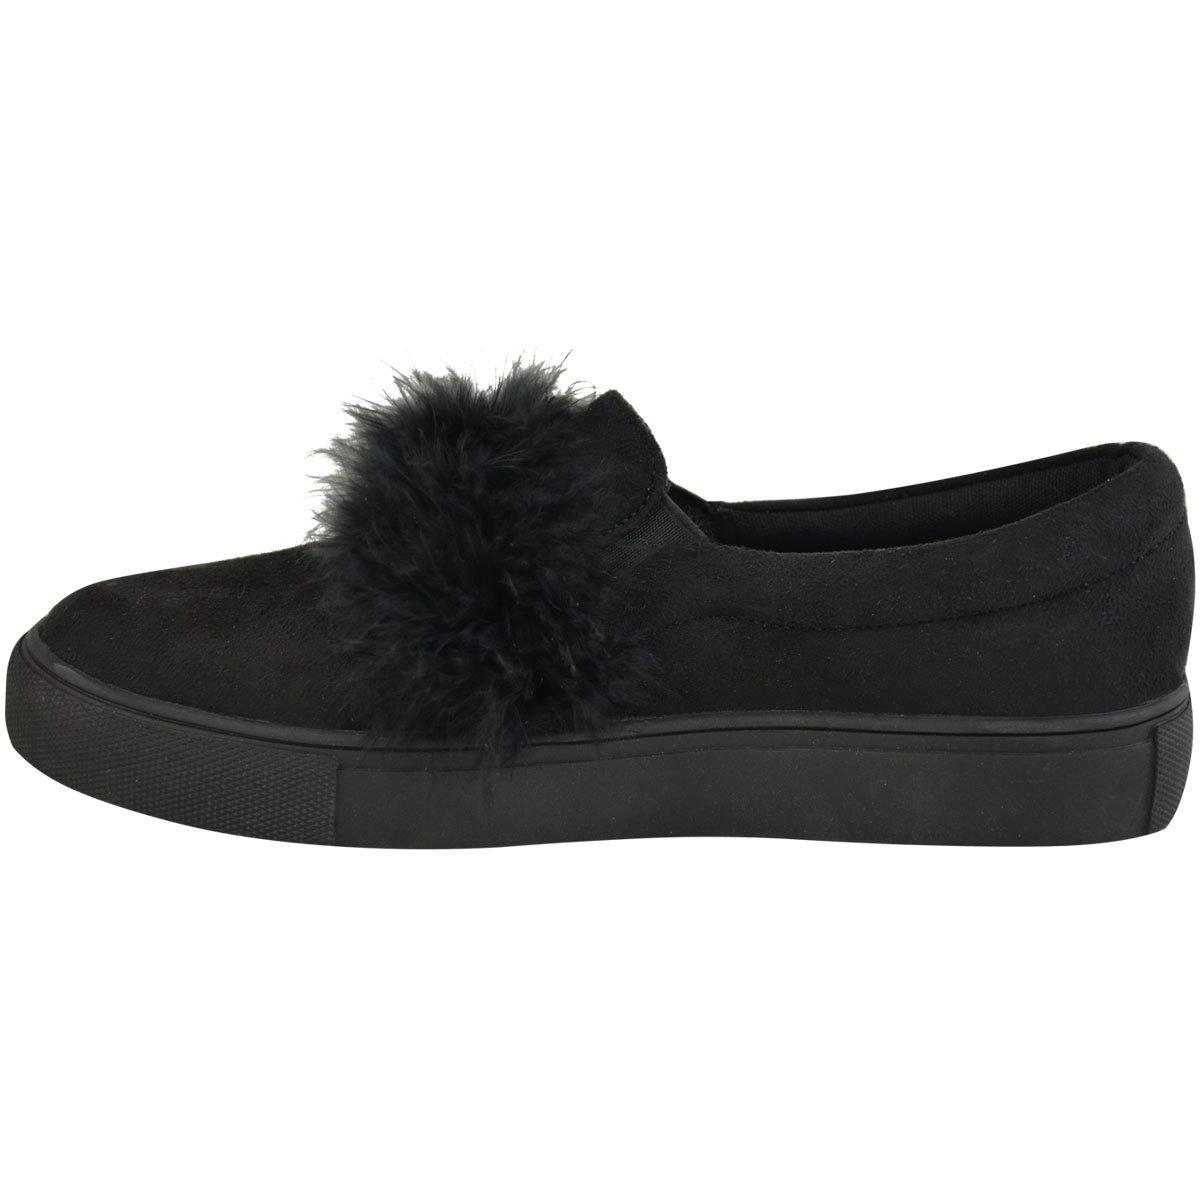 Sneakers casual nere per bambina Fashion thirsty CMJ7PjYoJm